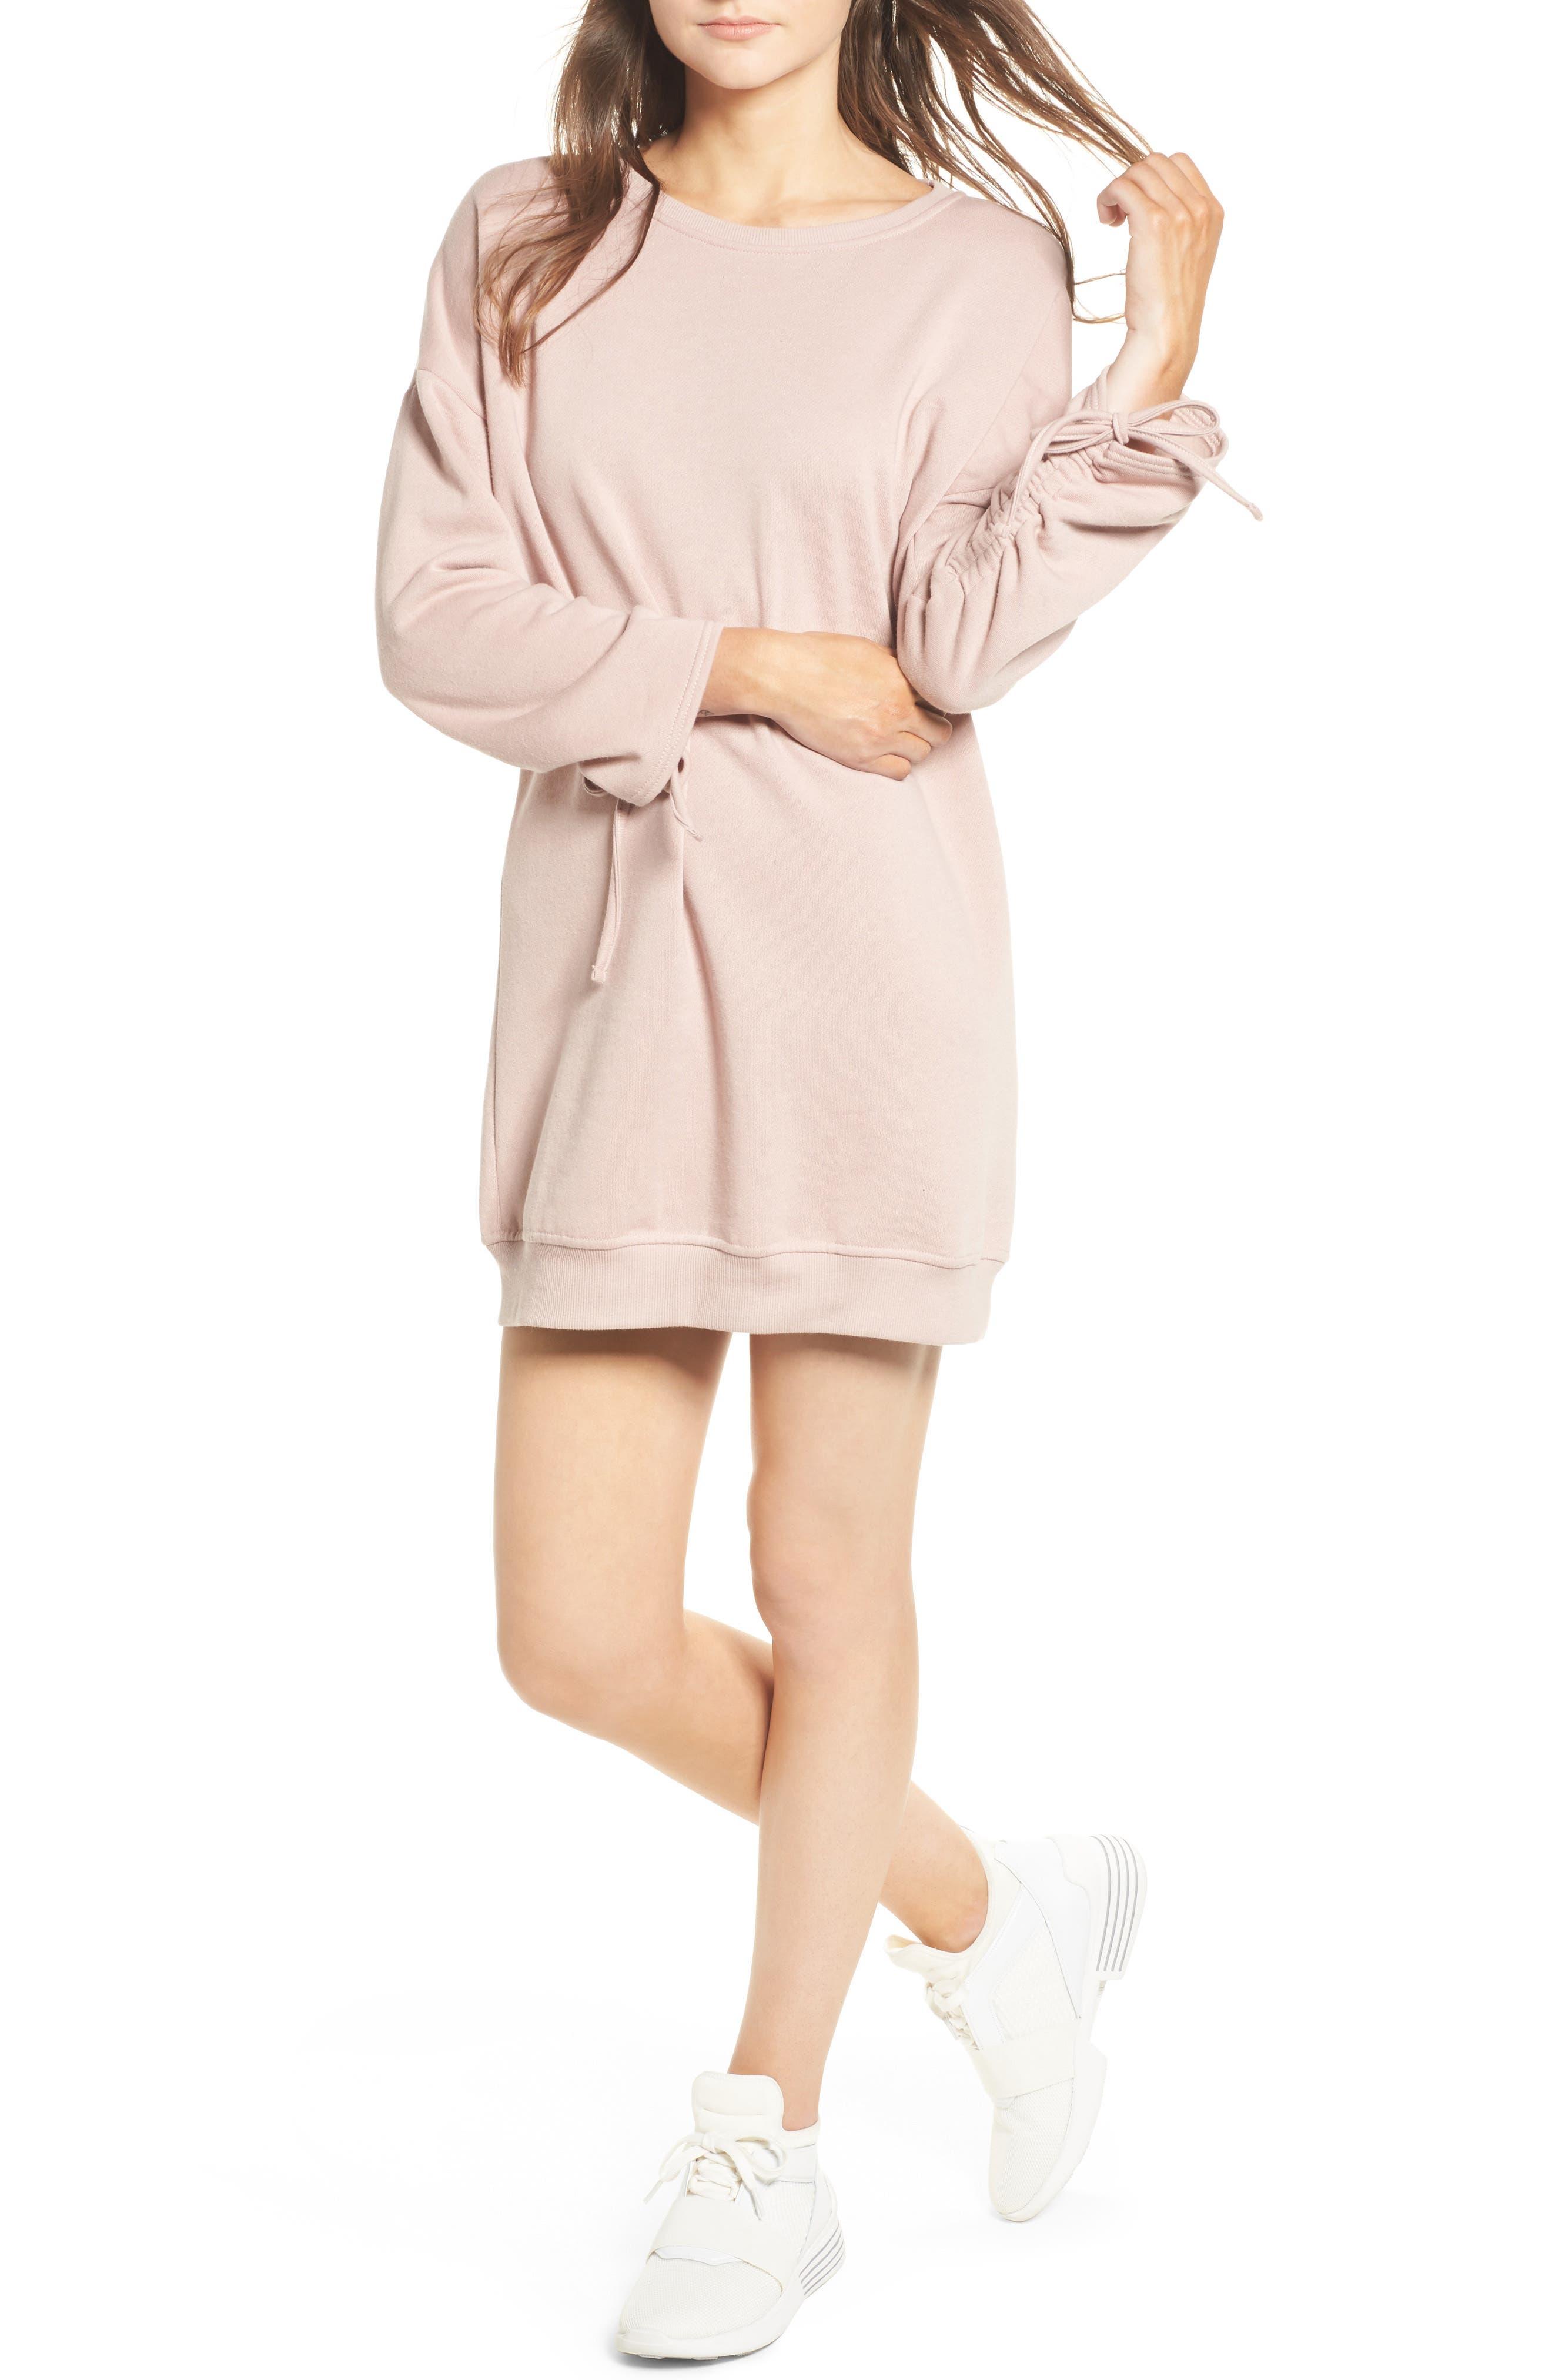 Alternate Image 1 Selected - Cotton Emporium Ruched Sleeve Sweatshirt Dress